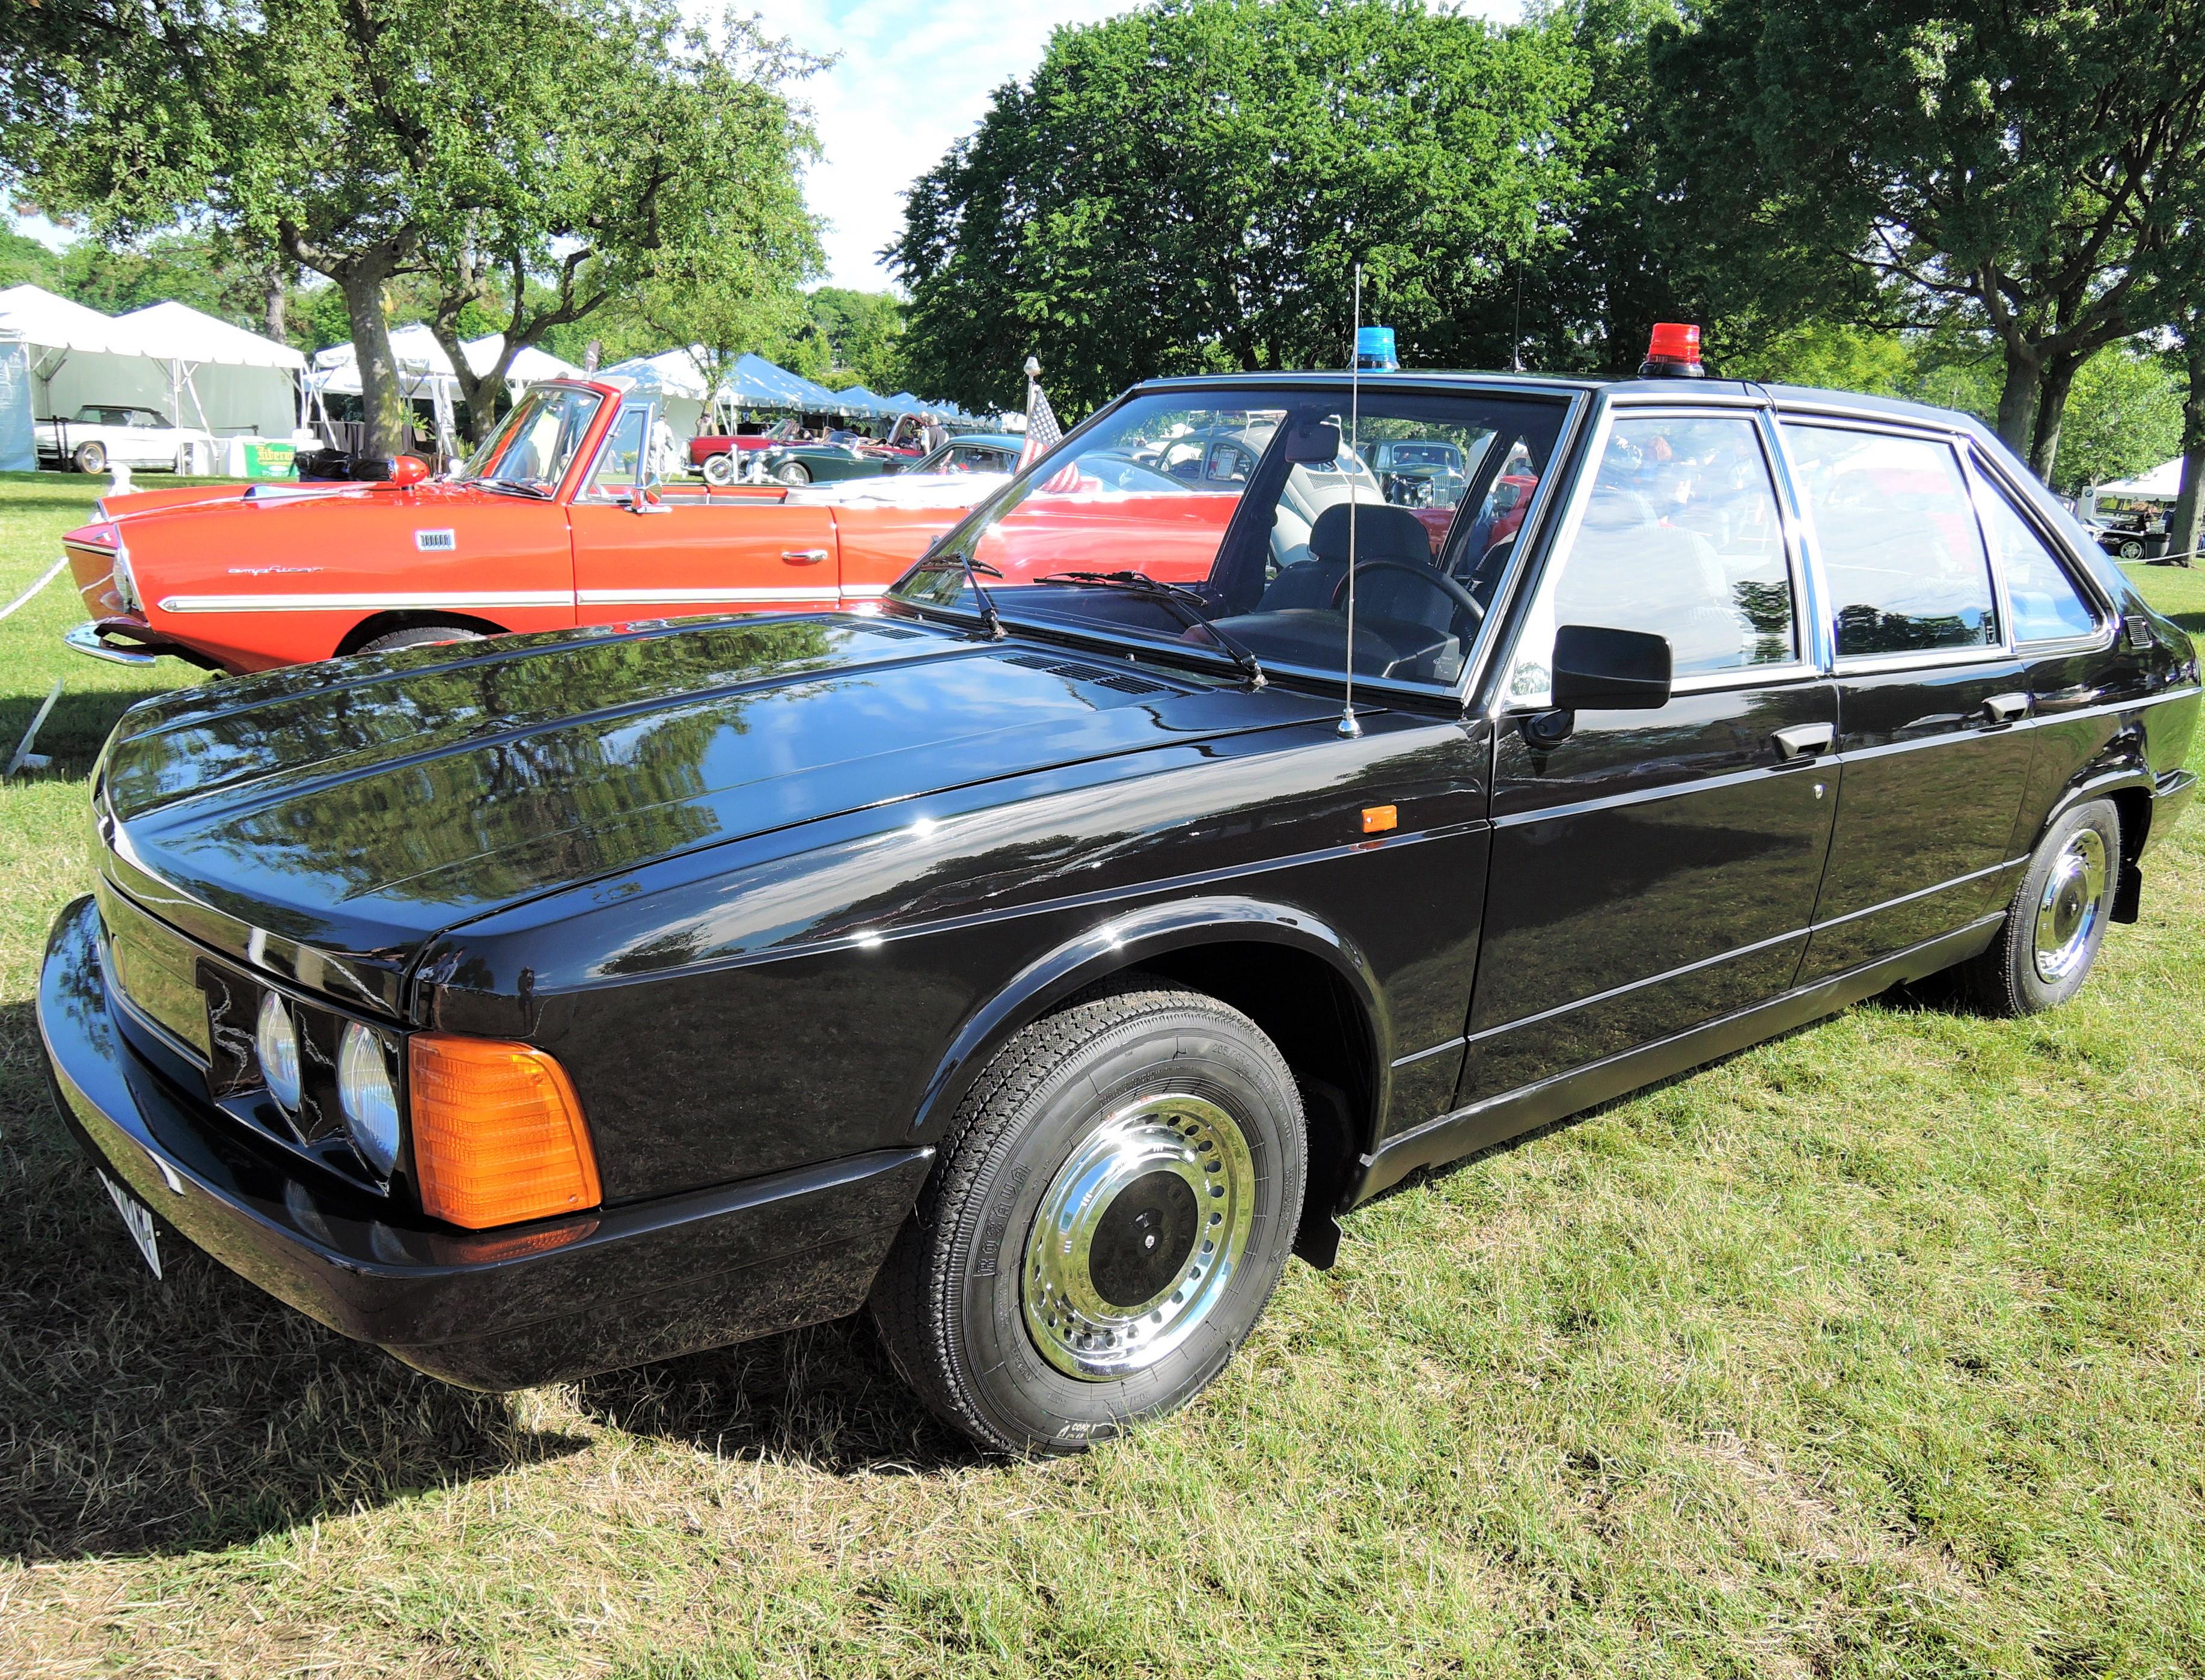 black 1989 Tatra 613 Sedan - Greenwich Concours d'Elegance 2017